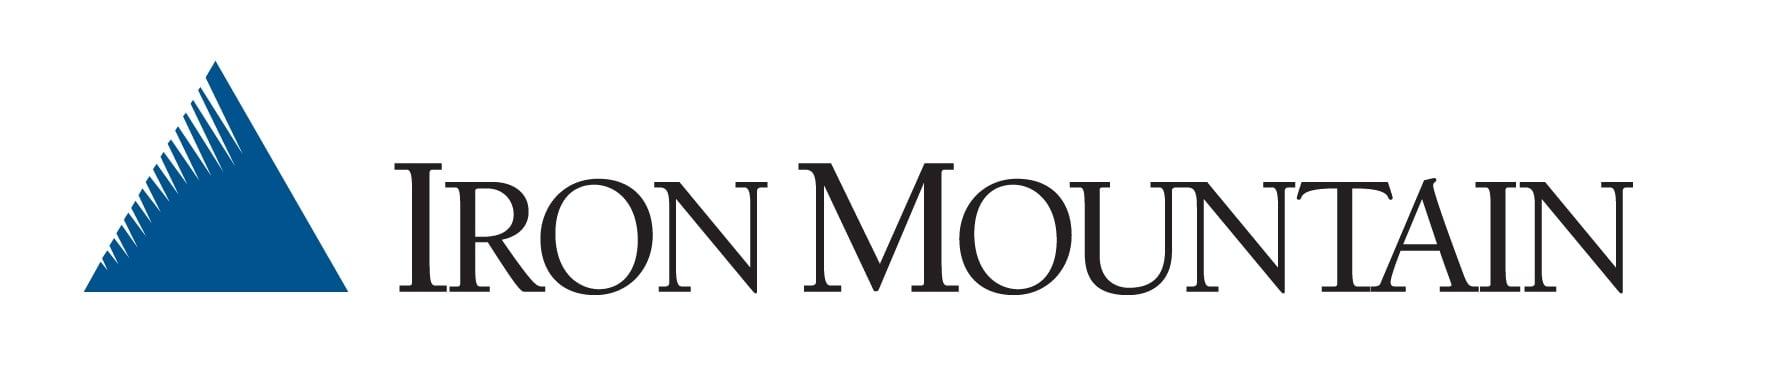 Iron Mountain Incorporated logo